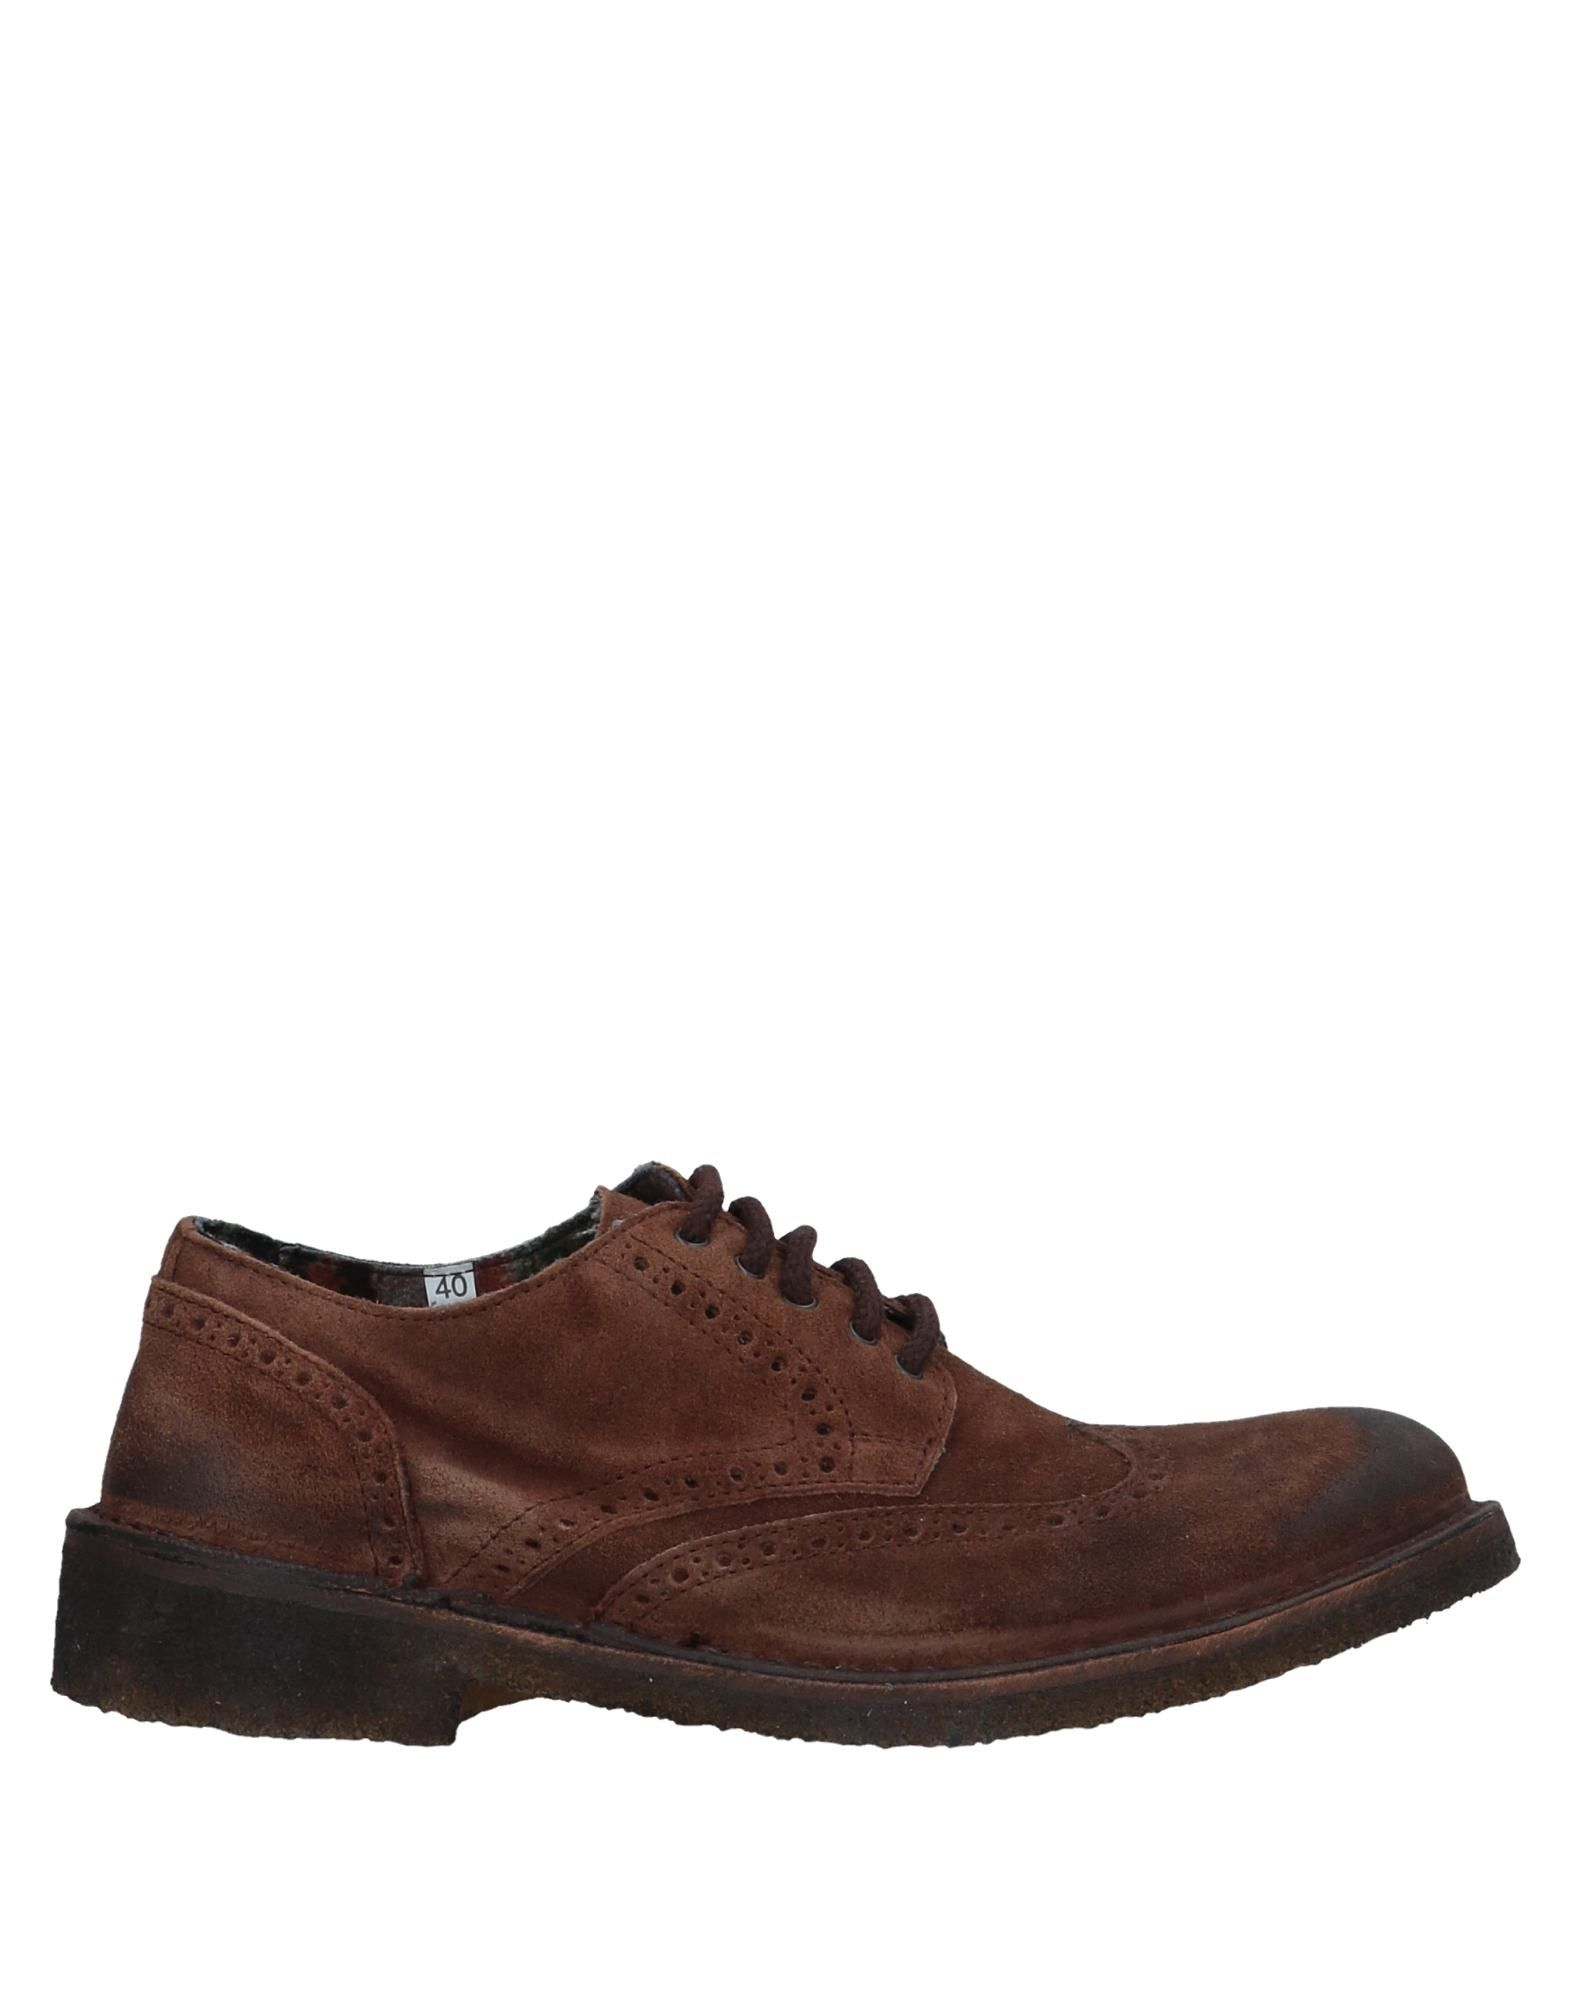 WEG Обувь на шнурках 10 pcs argon arc welding cerium tungsten electrodes 1 6mm x 150mm gray